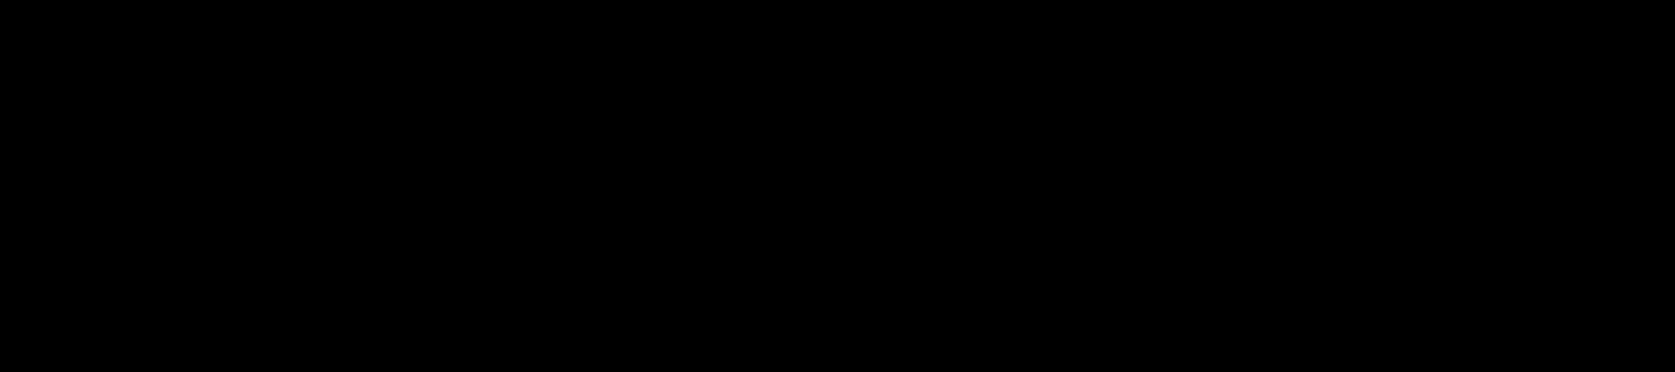 lexoplogoV4_B-1-3